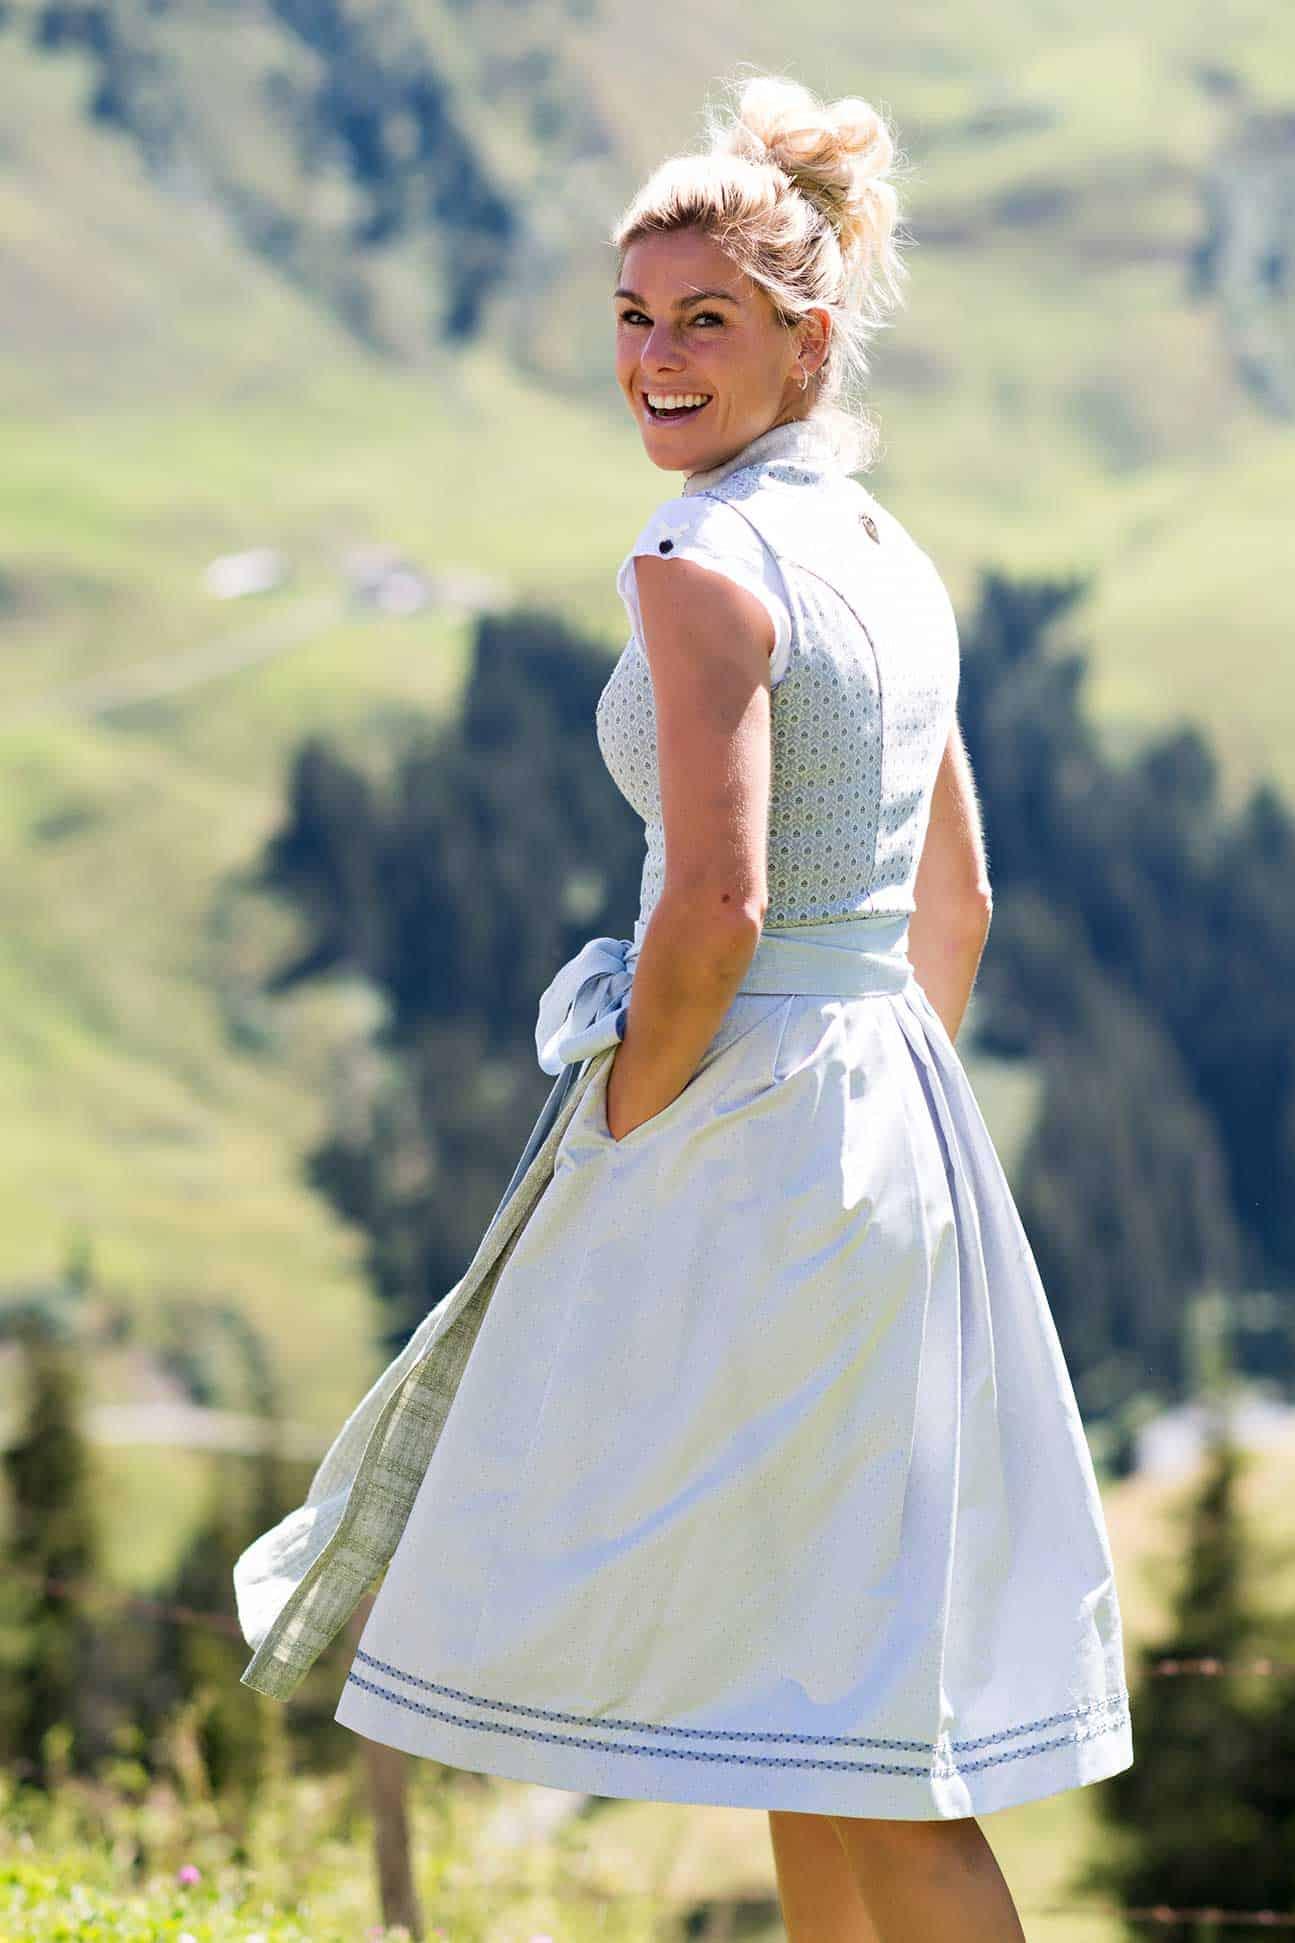 Belli von der Sonnbühel in Kitzbühel Kooperationspartner AlpenHerz